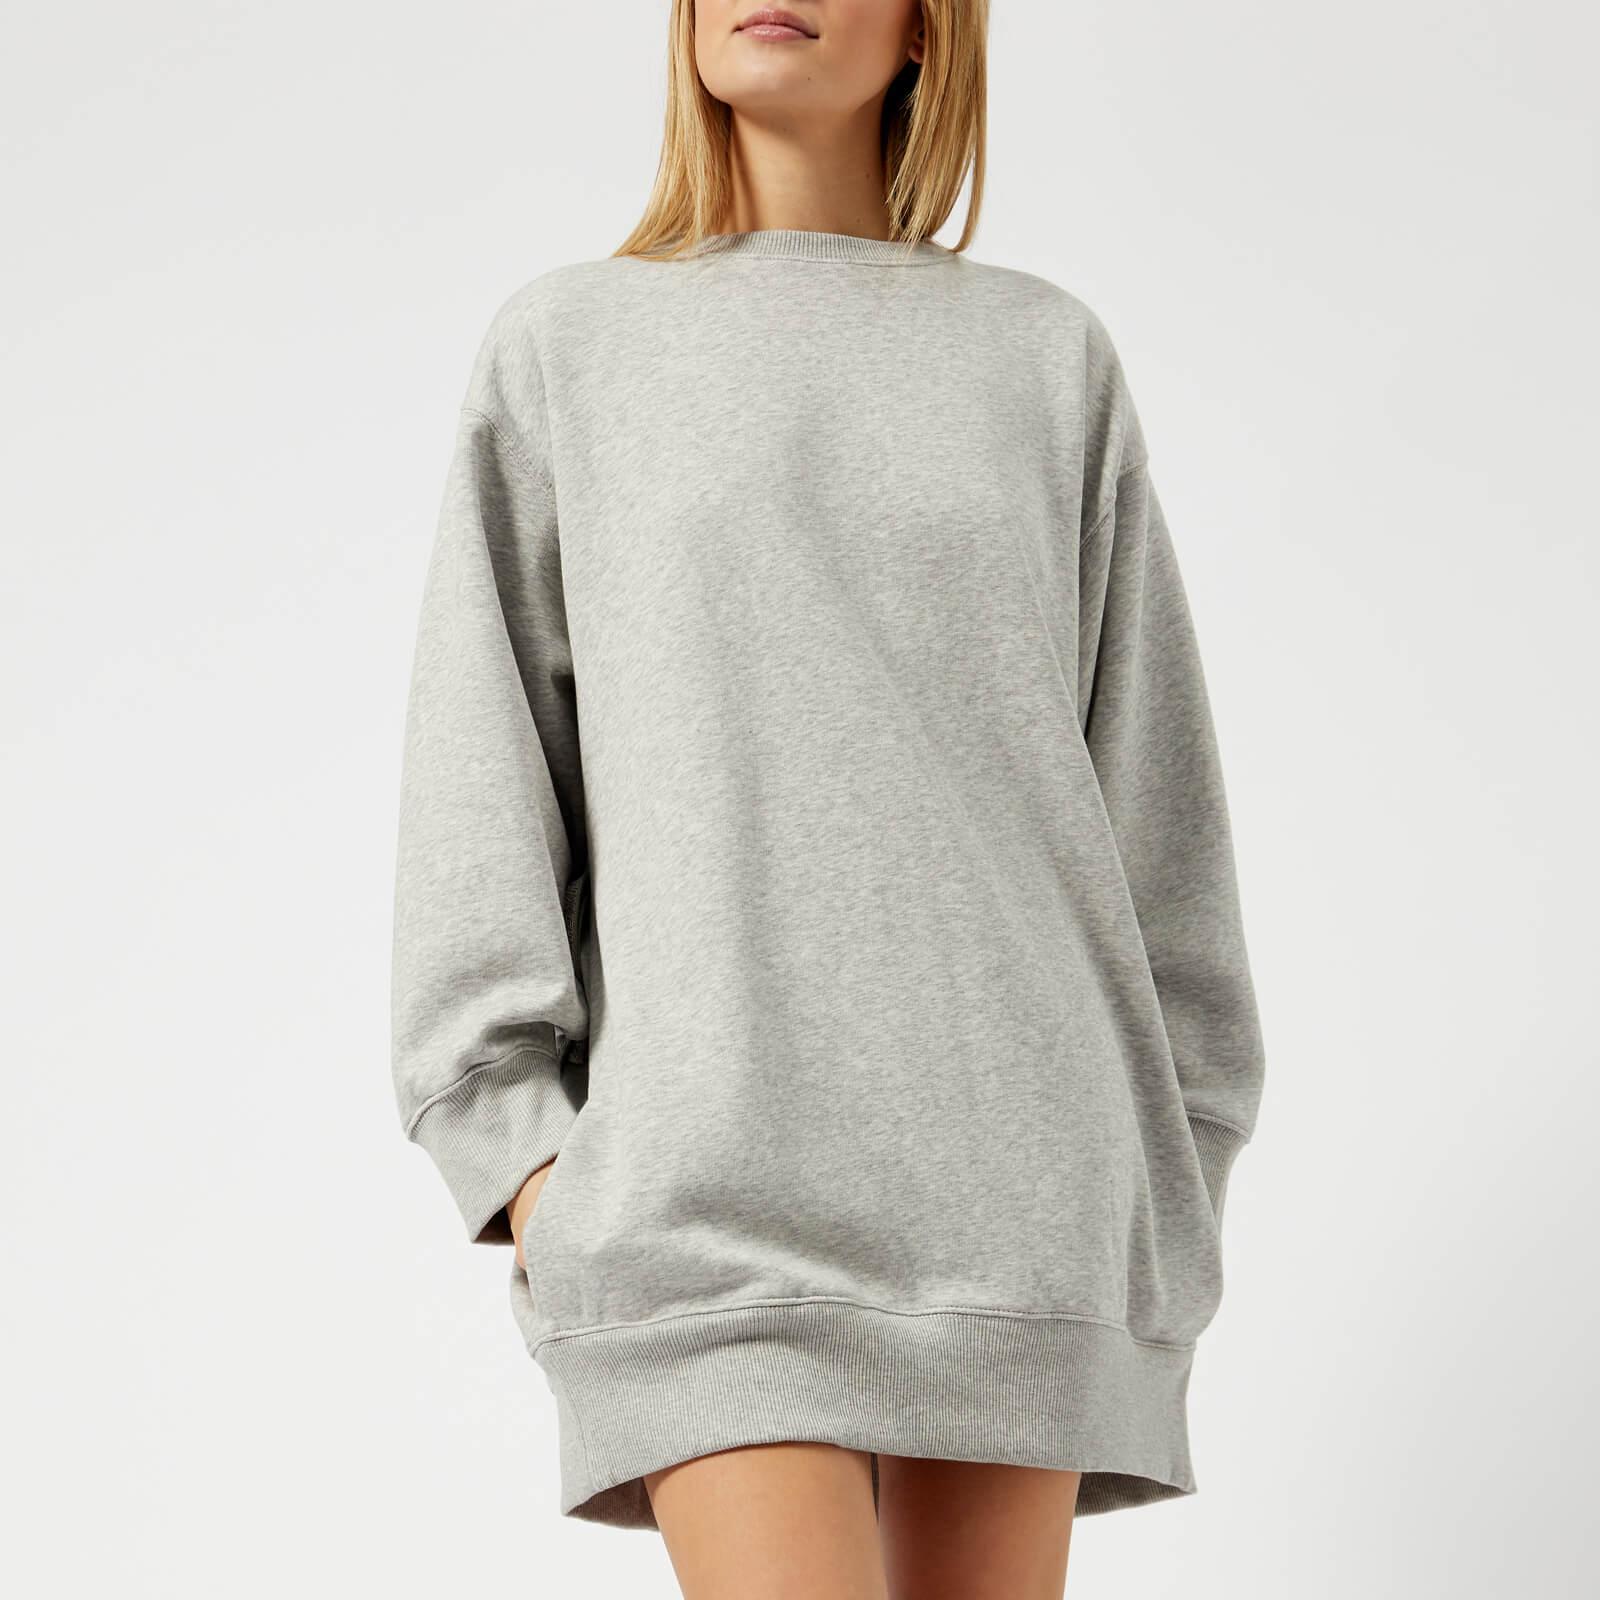 eff7245c Tommy Hilfiger X GIGI Women's Open Back Sweat Dress - Light Grey Heather -  Free UK Delivery over £50